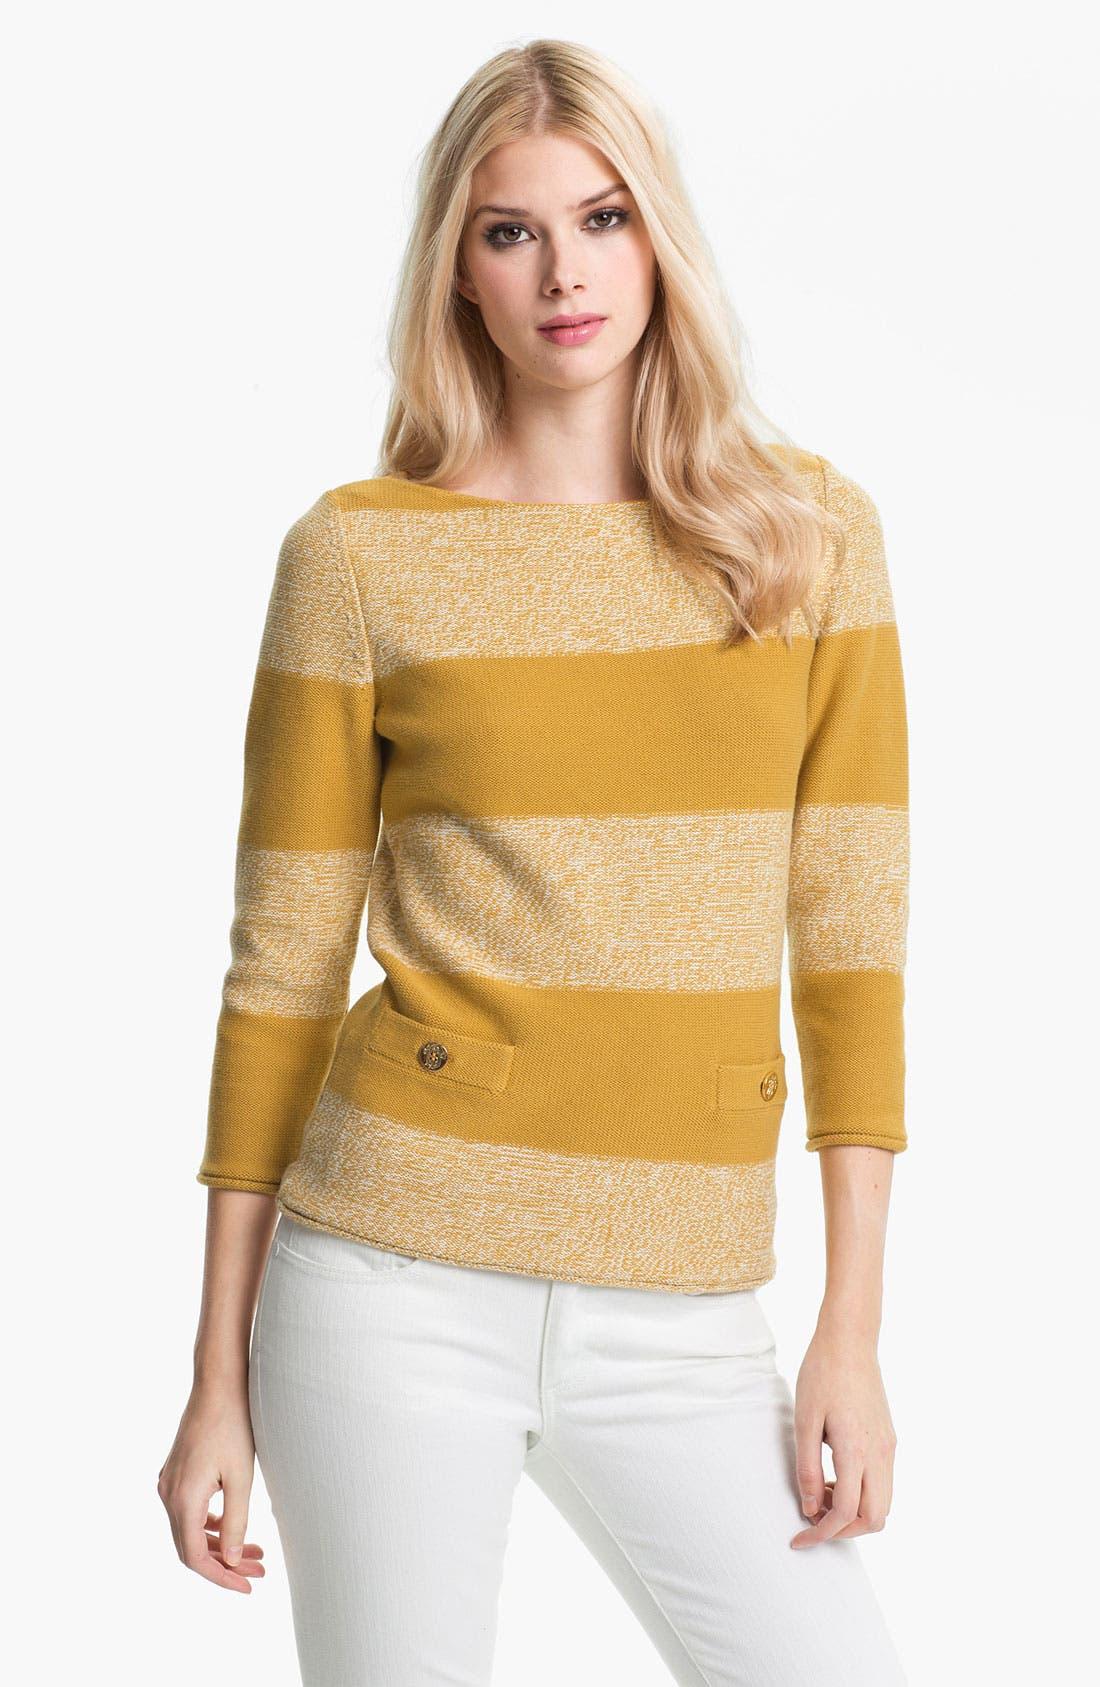 Main Image - Tory Burch 'Becky' Sweater